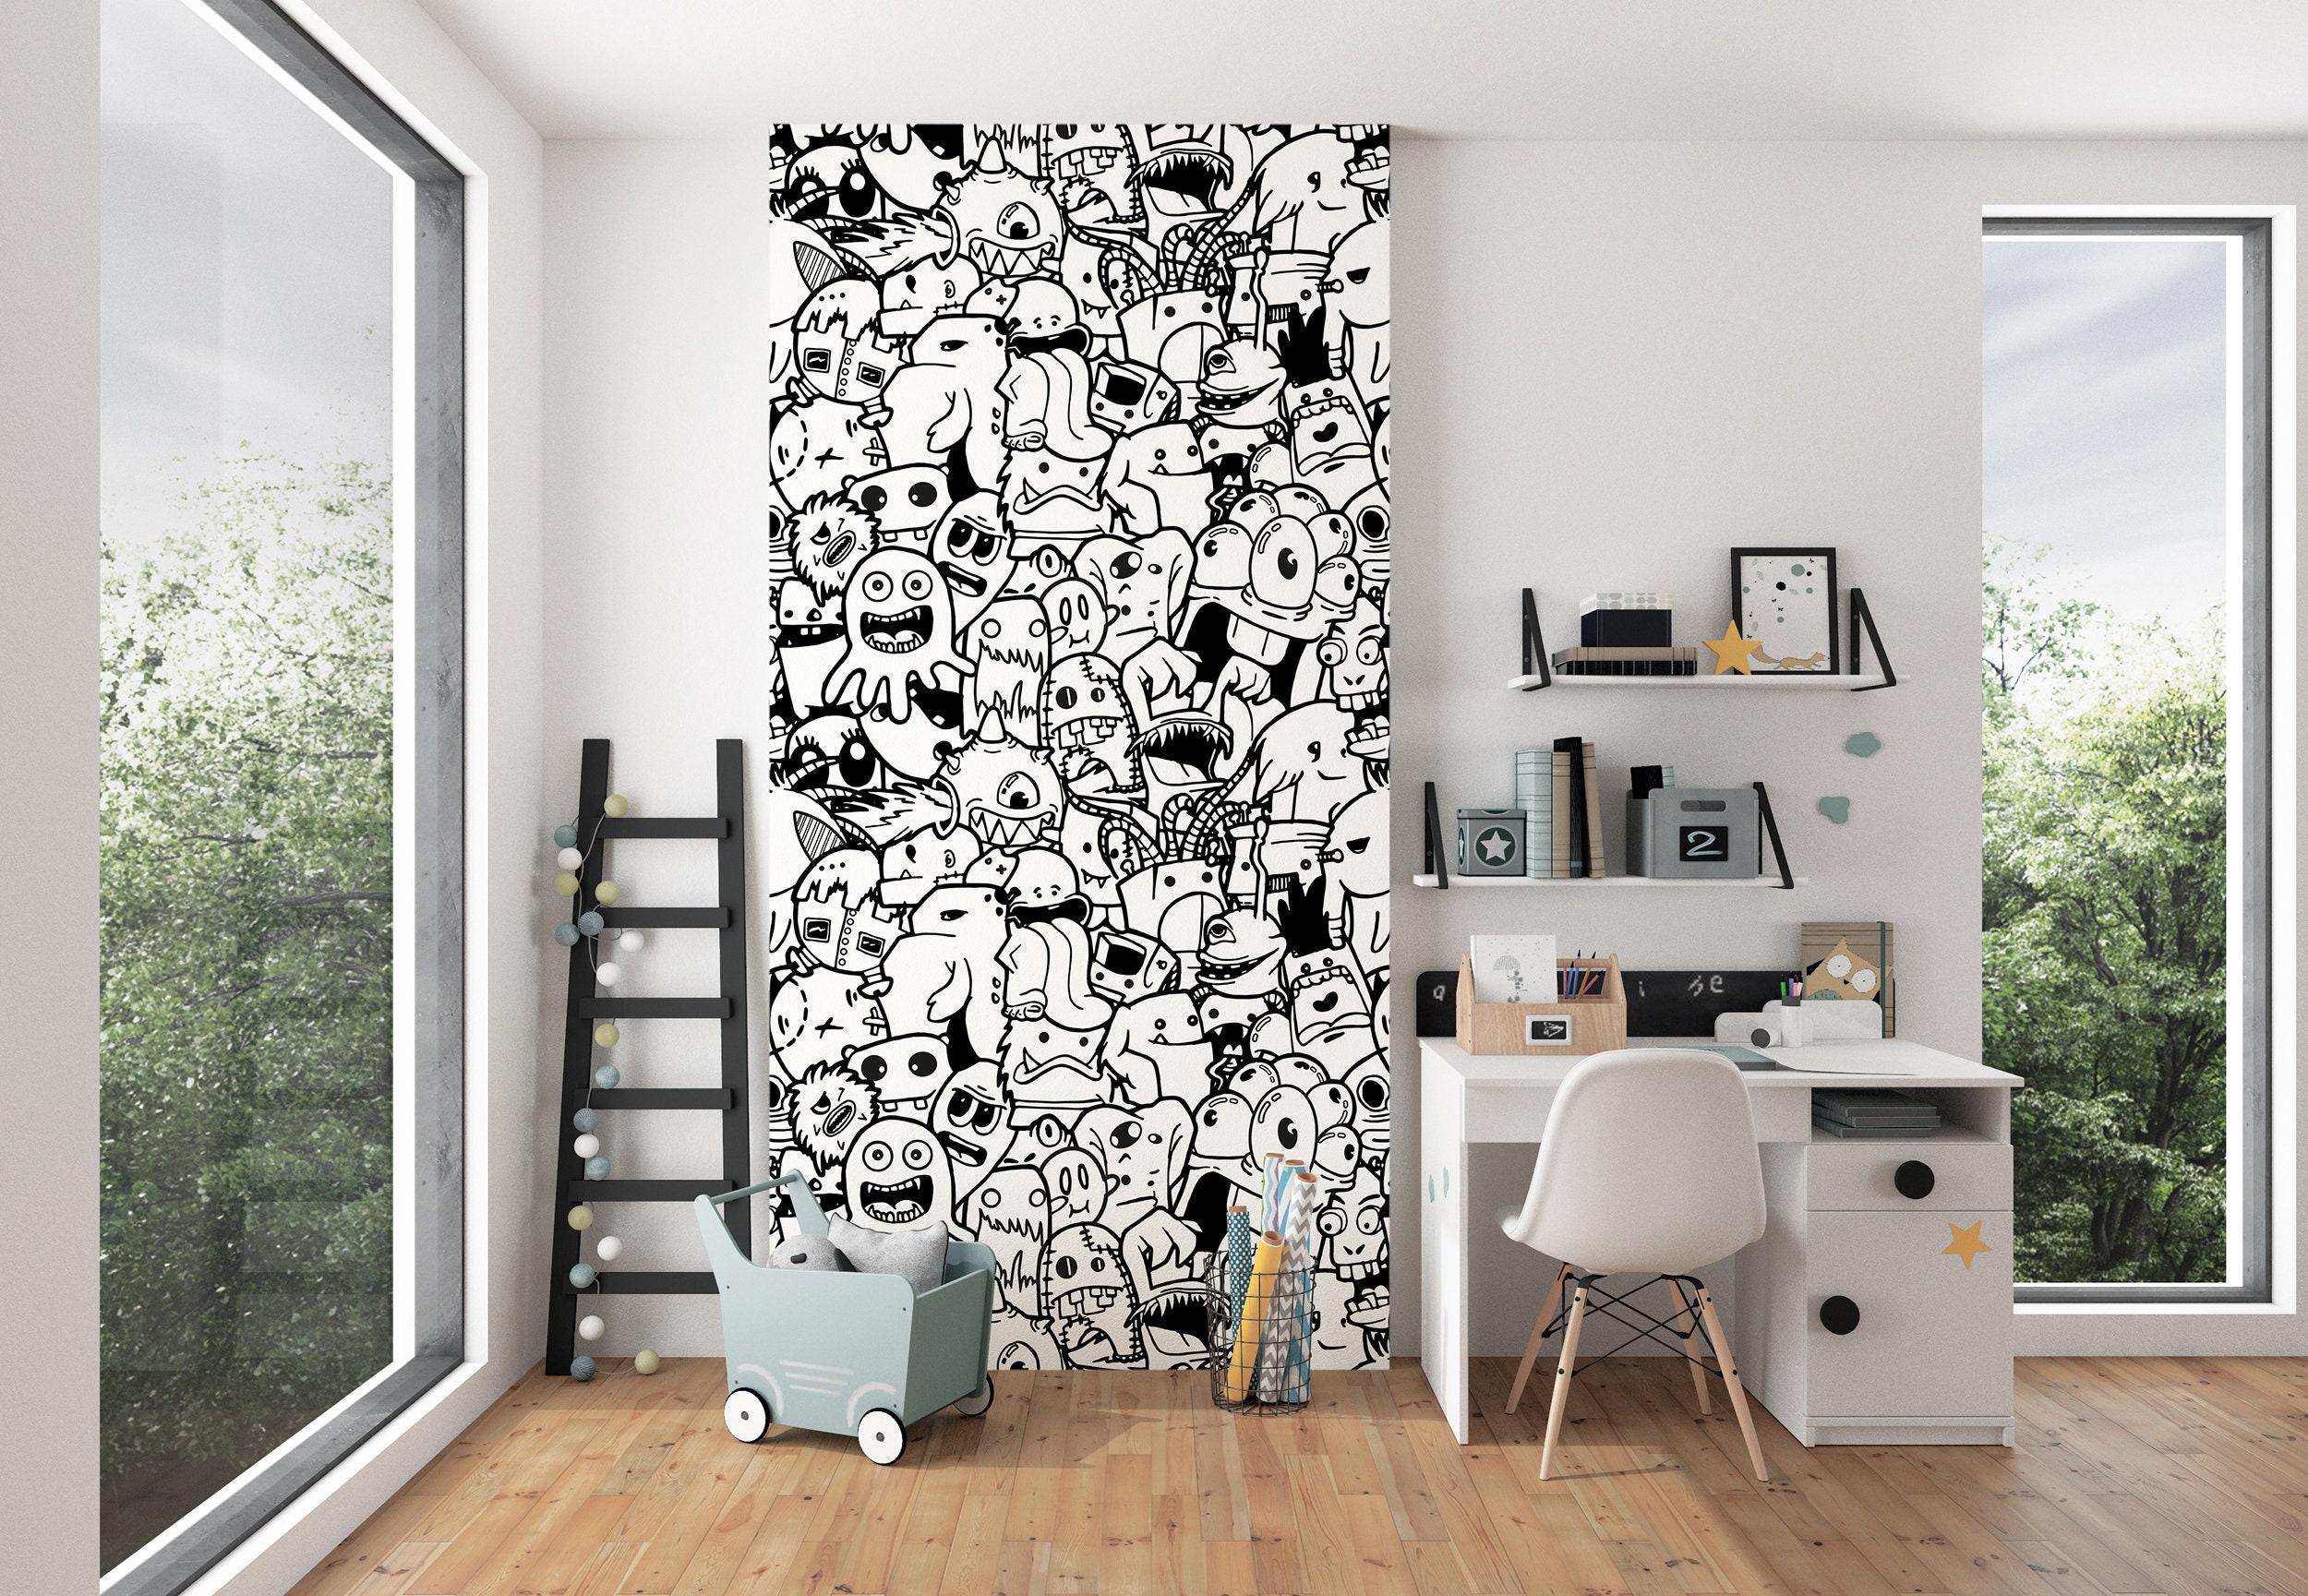 Kids Room Doodles Wallpaper Nursery Wall Murals Black White Etsy